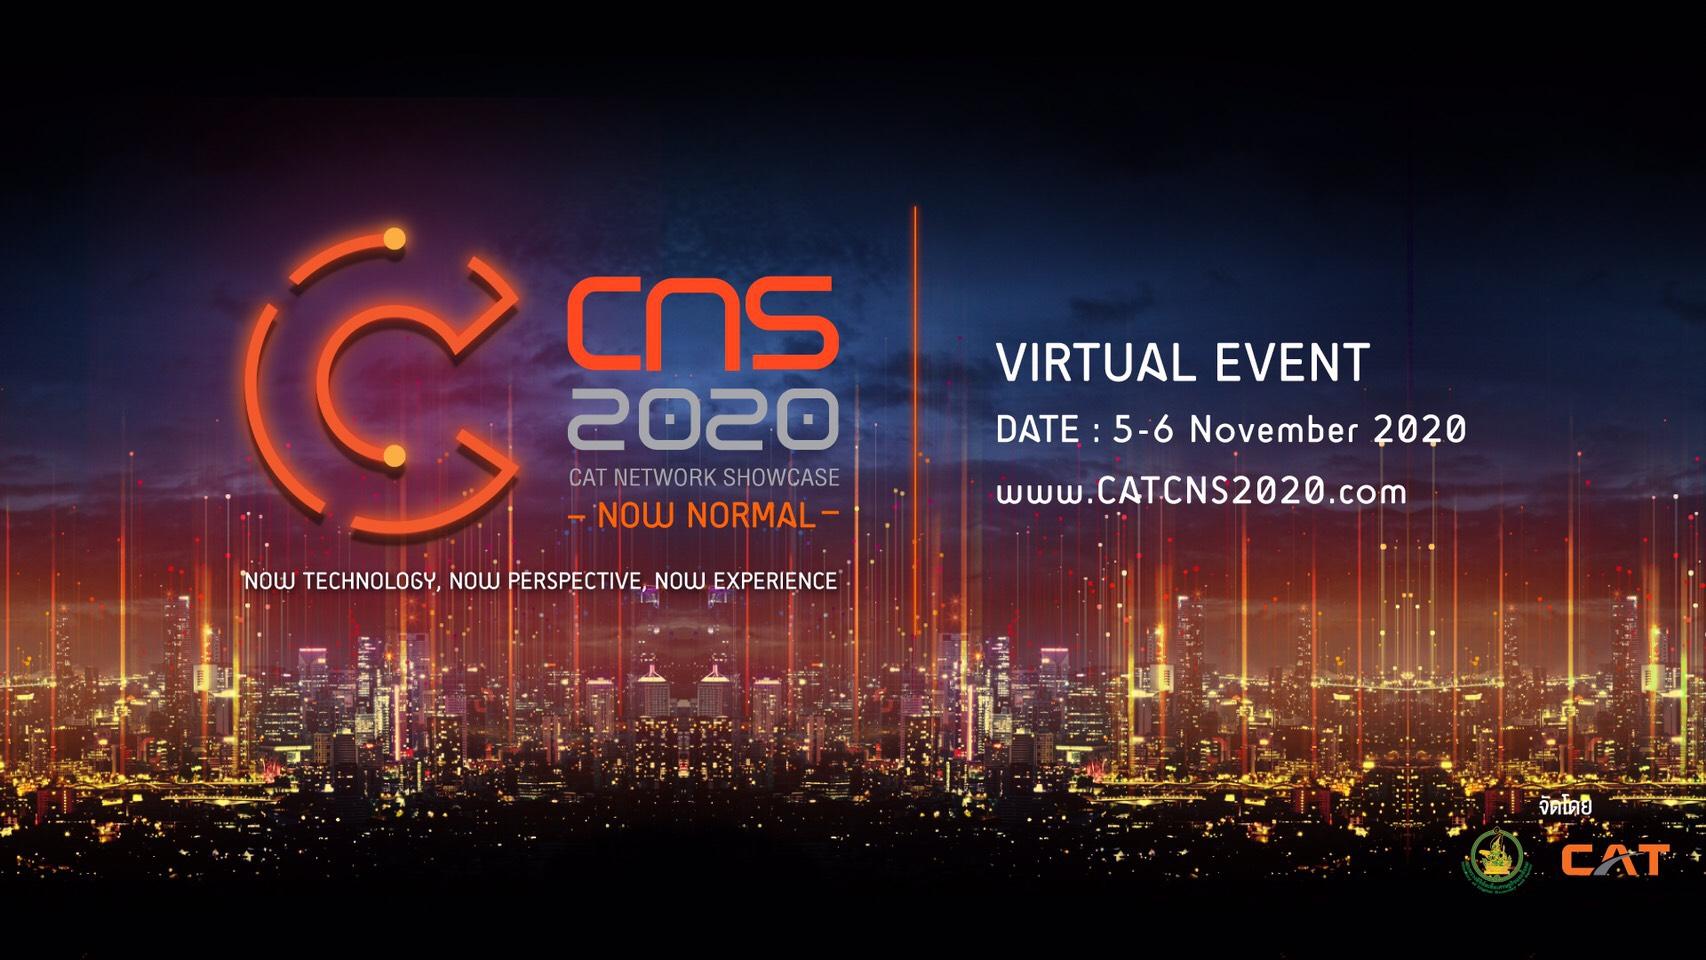 CAT รุกเทคโนโลยีดิจิทัล พลิกโฉมจัด CAT Network Showcase 2020  แบบ Virtual Event รับไลฟ์สไตล์ยุค New Normal